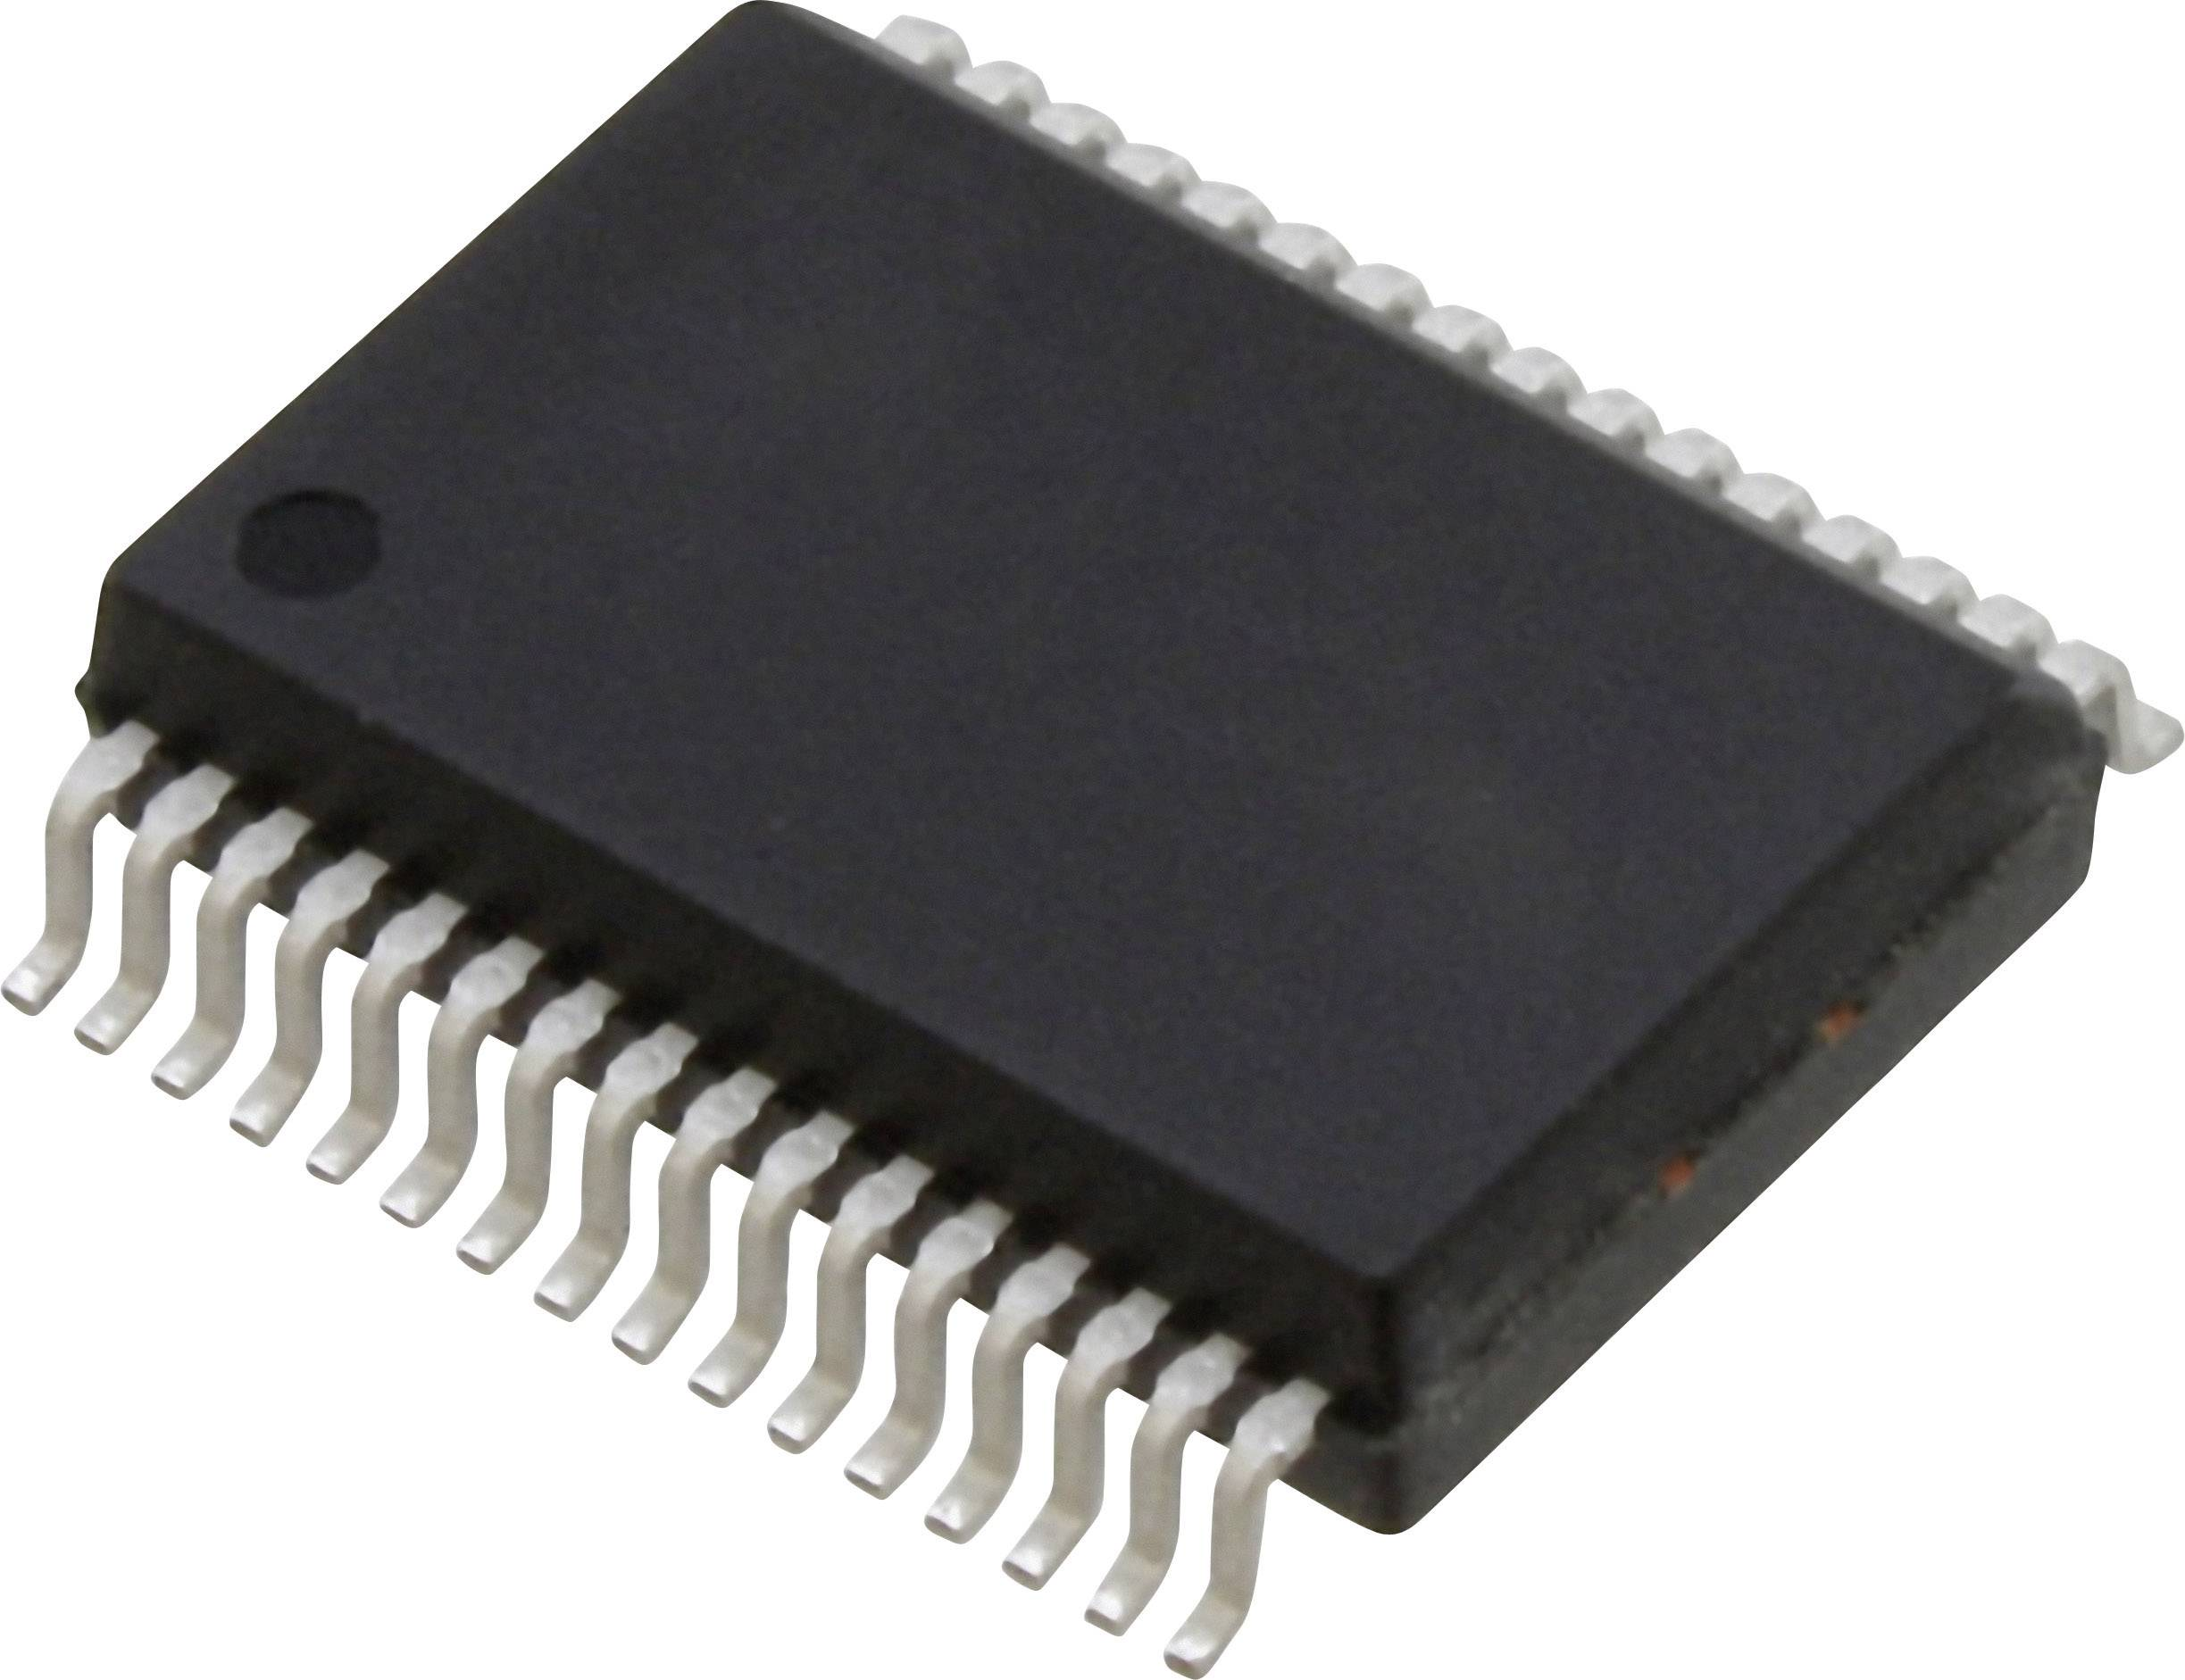 Výkonové spínače, záťaže, tranzistory